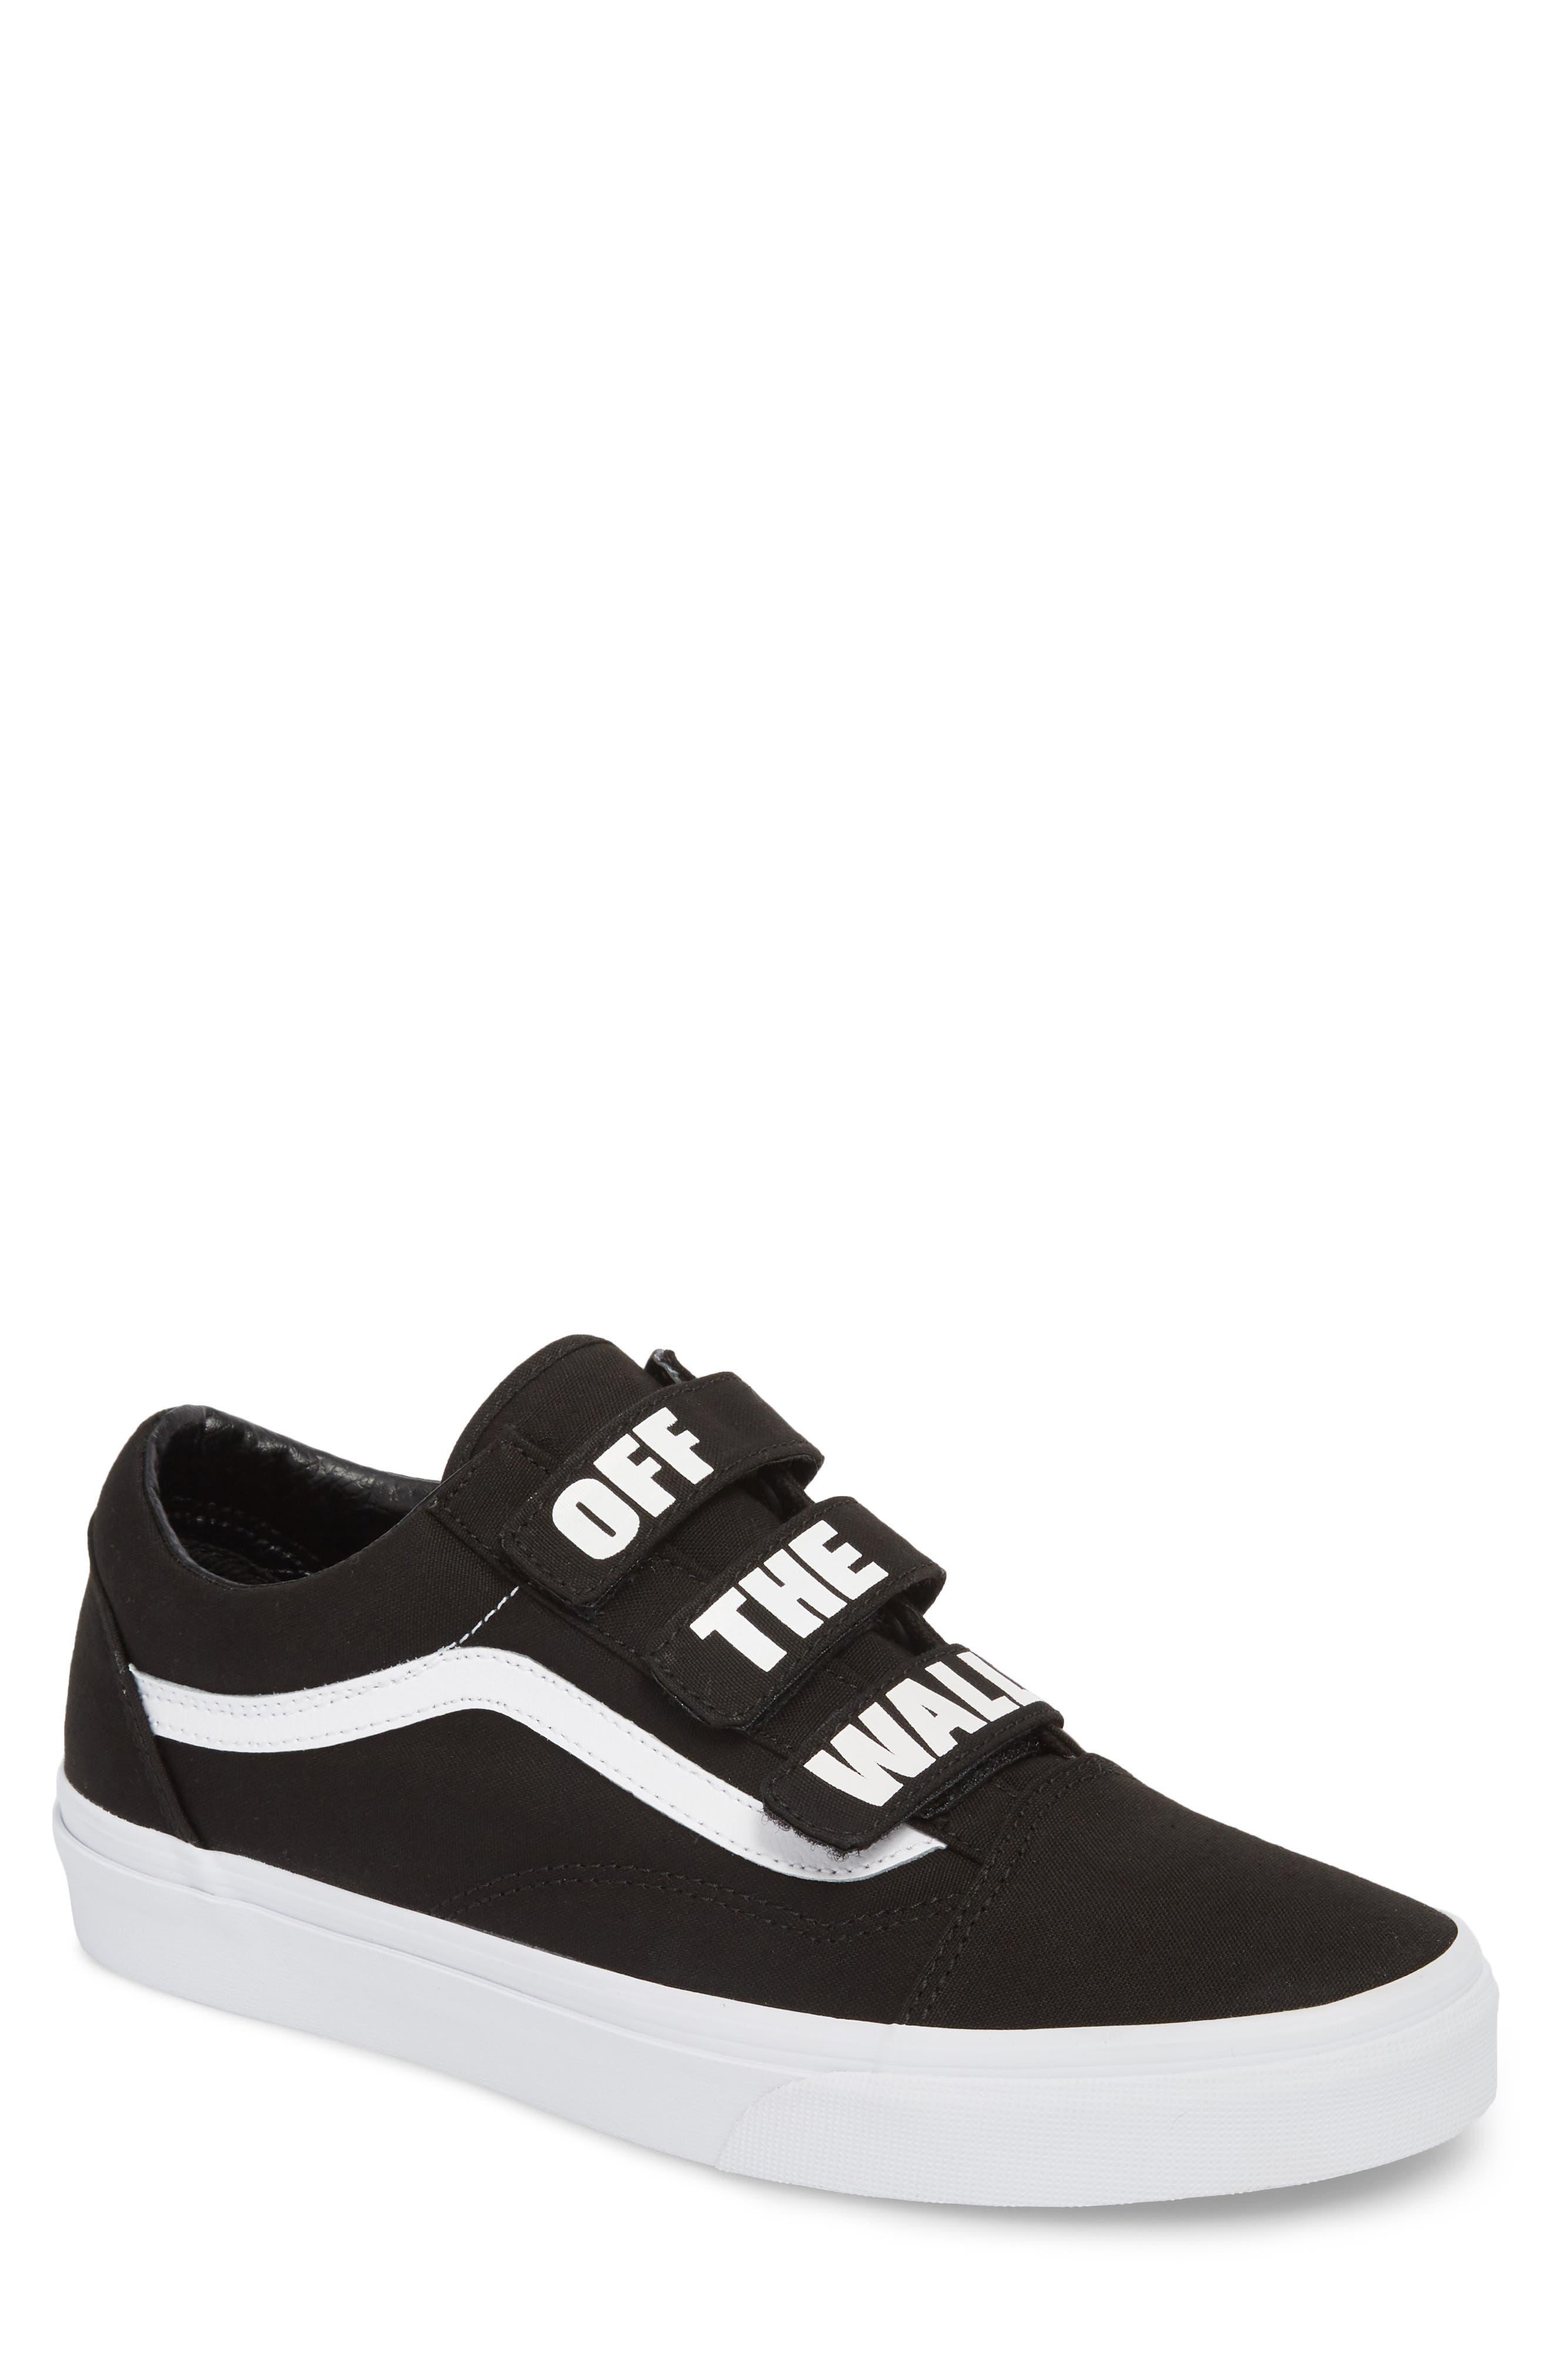 Off the Wall Old Skool V Sneaker,                         Main,                         color, Black/ True White